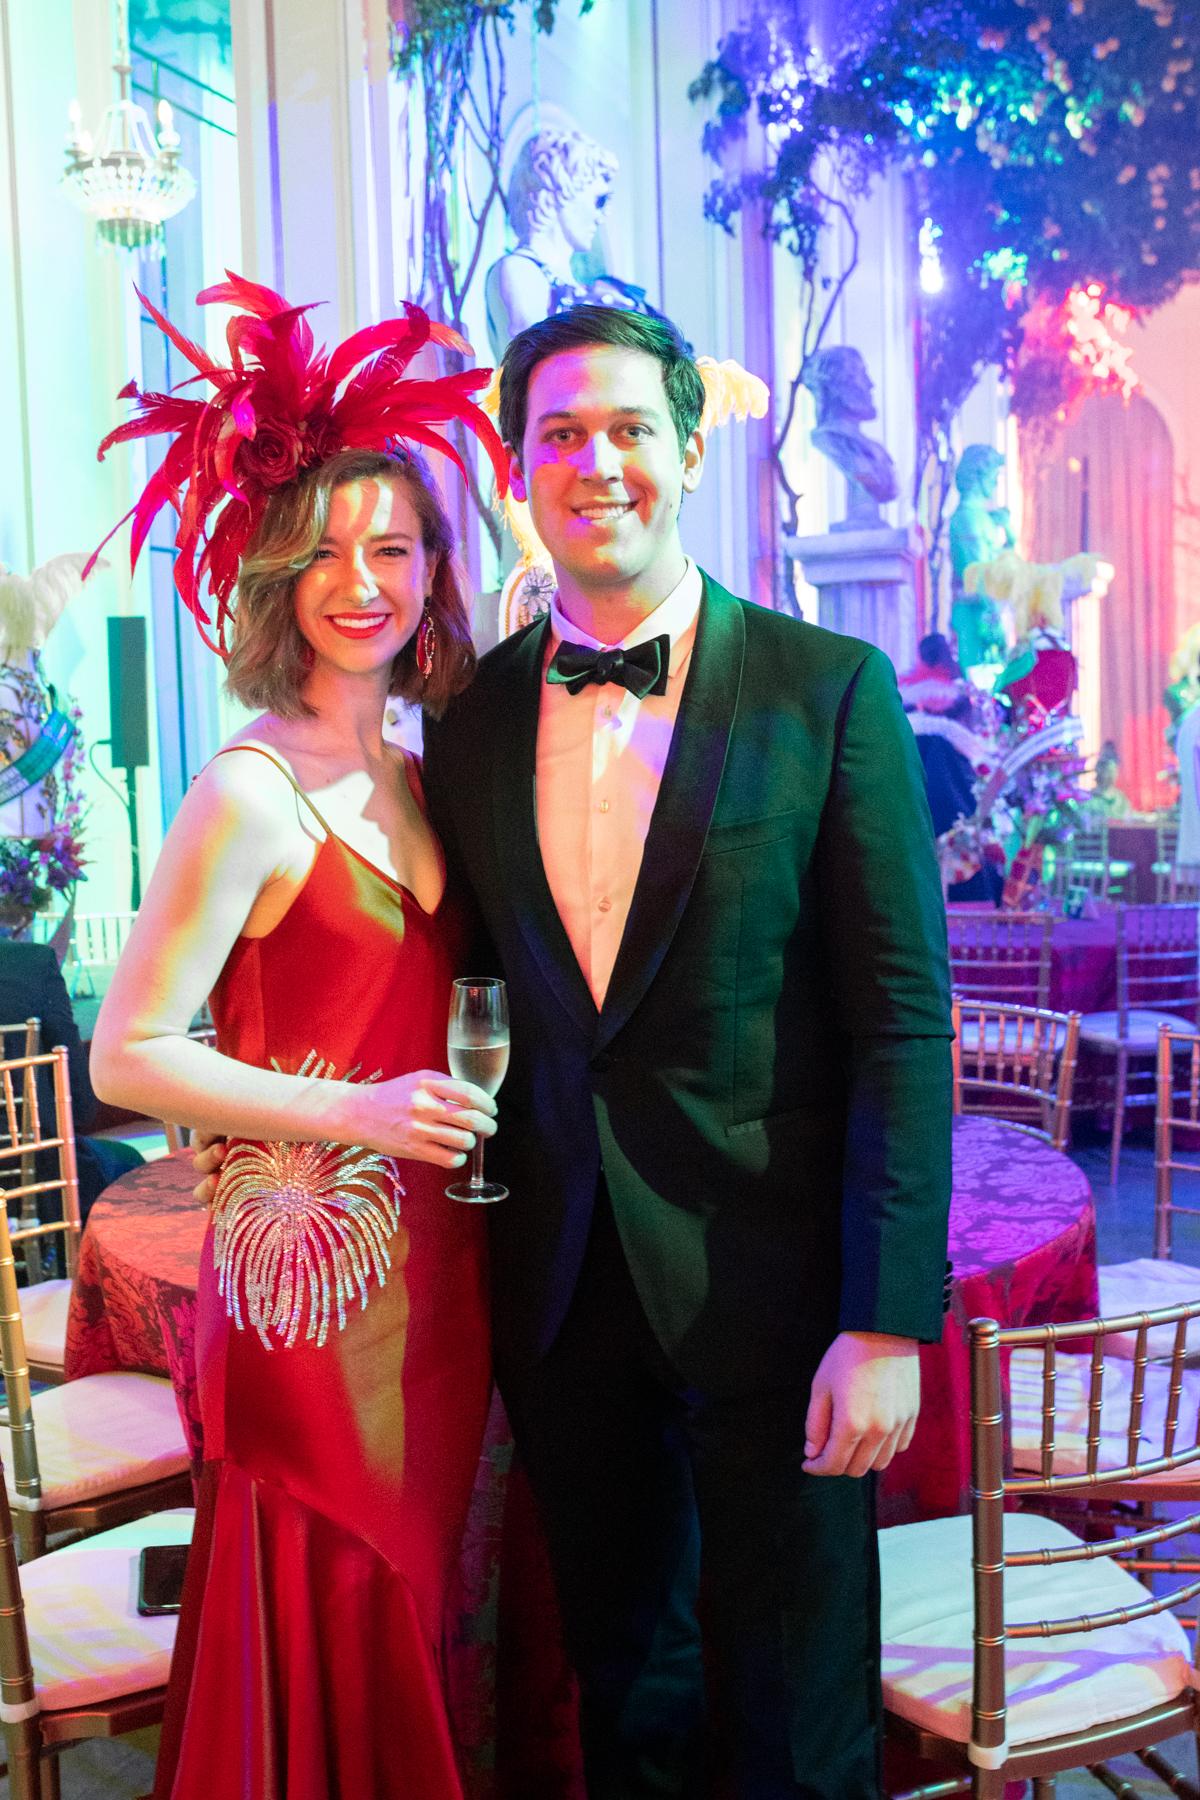 Stacie Flinner x Belmond Copacabana Carnival Ball-18.jpg